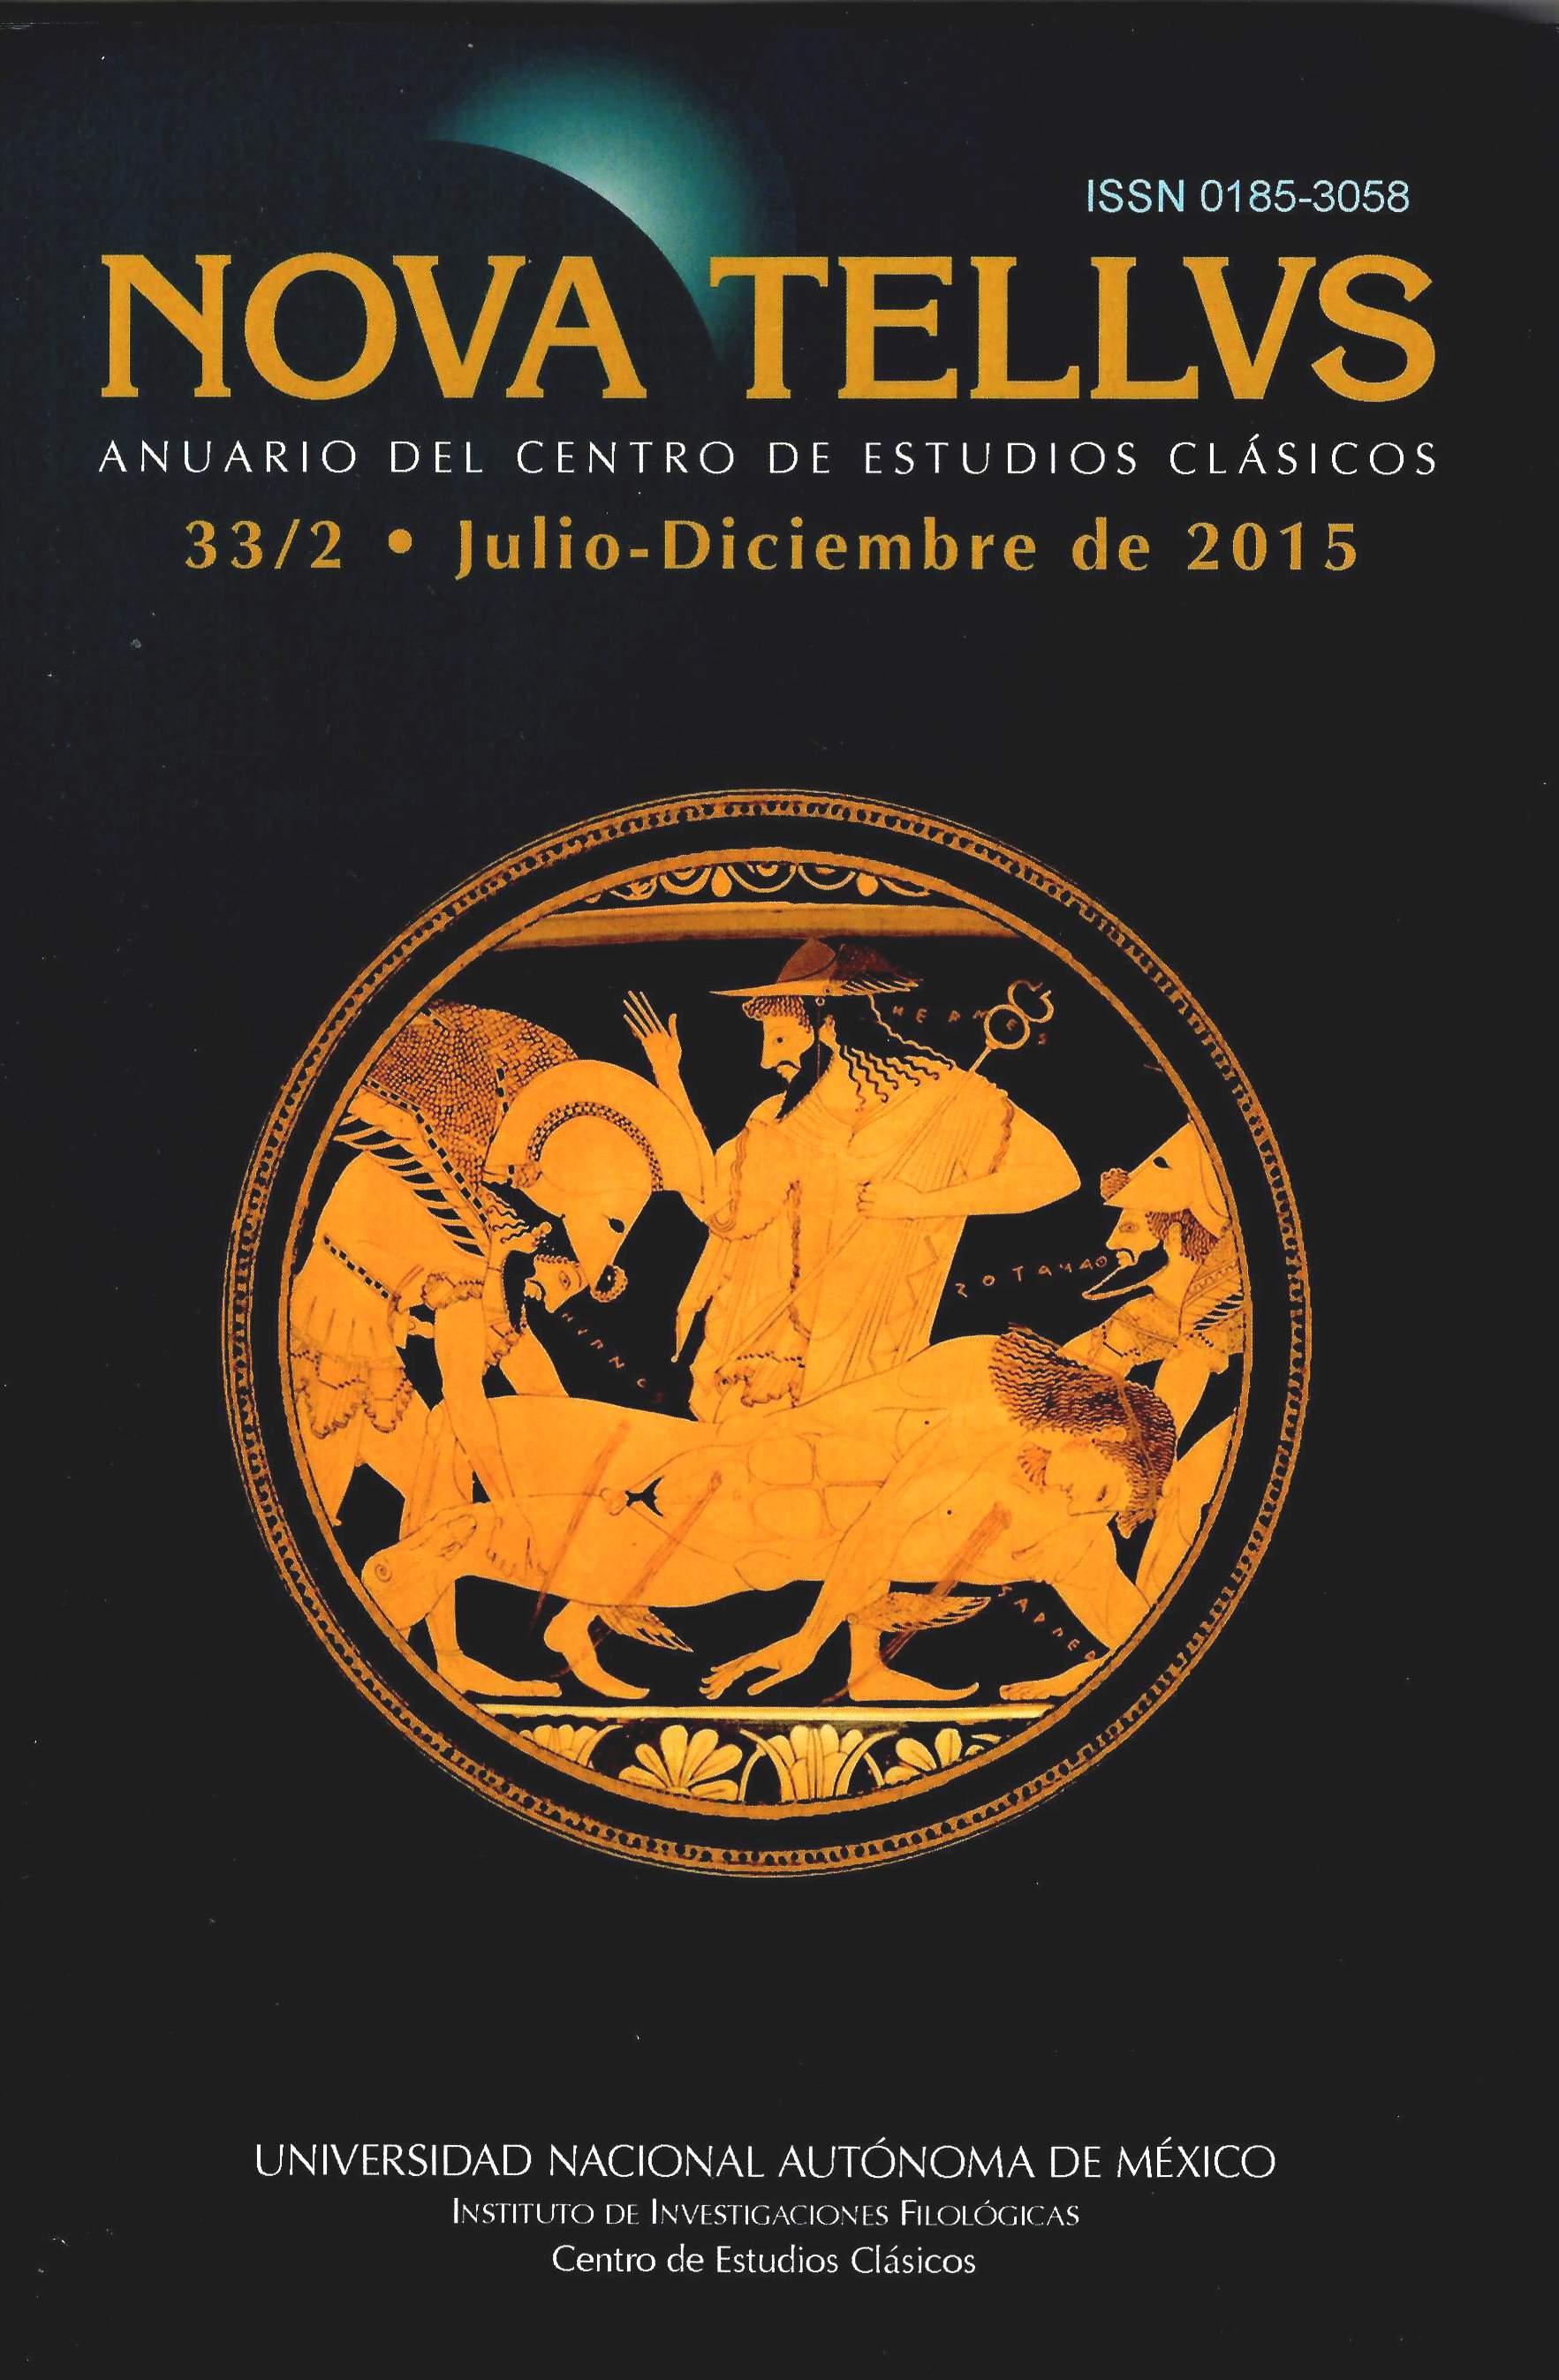 Nova Tellvs. Anuario del centro de estudios clásicos 33/2, jul-dic 2015